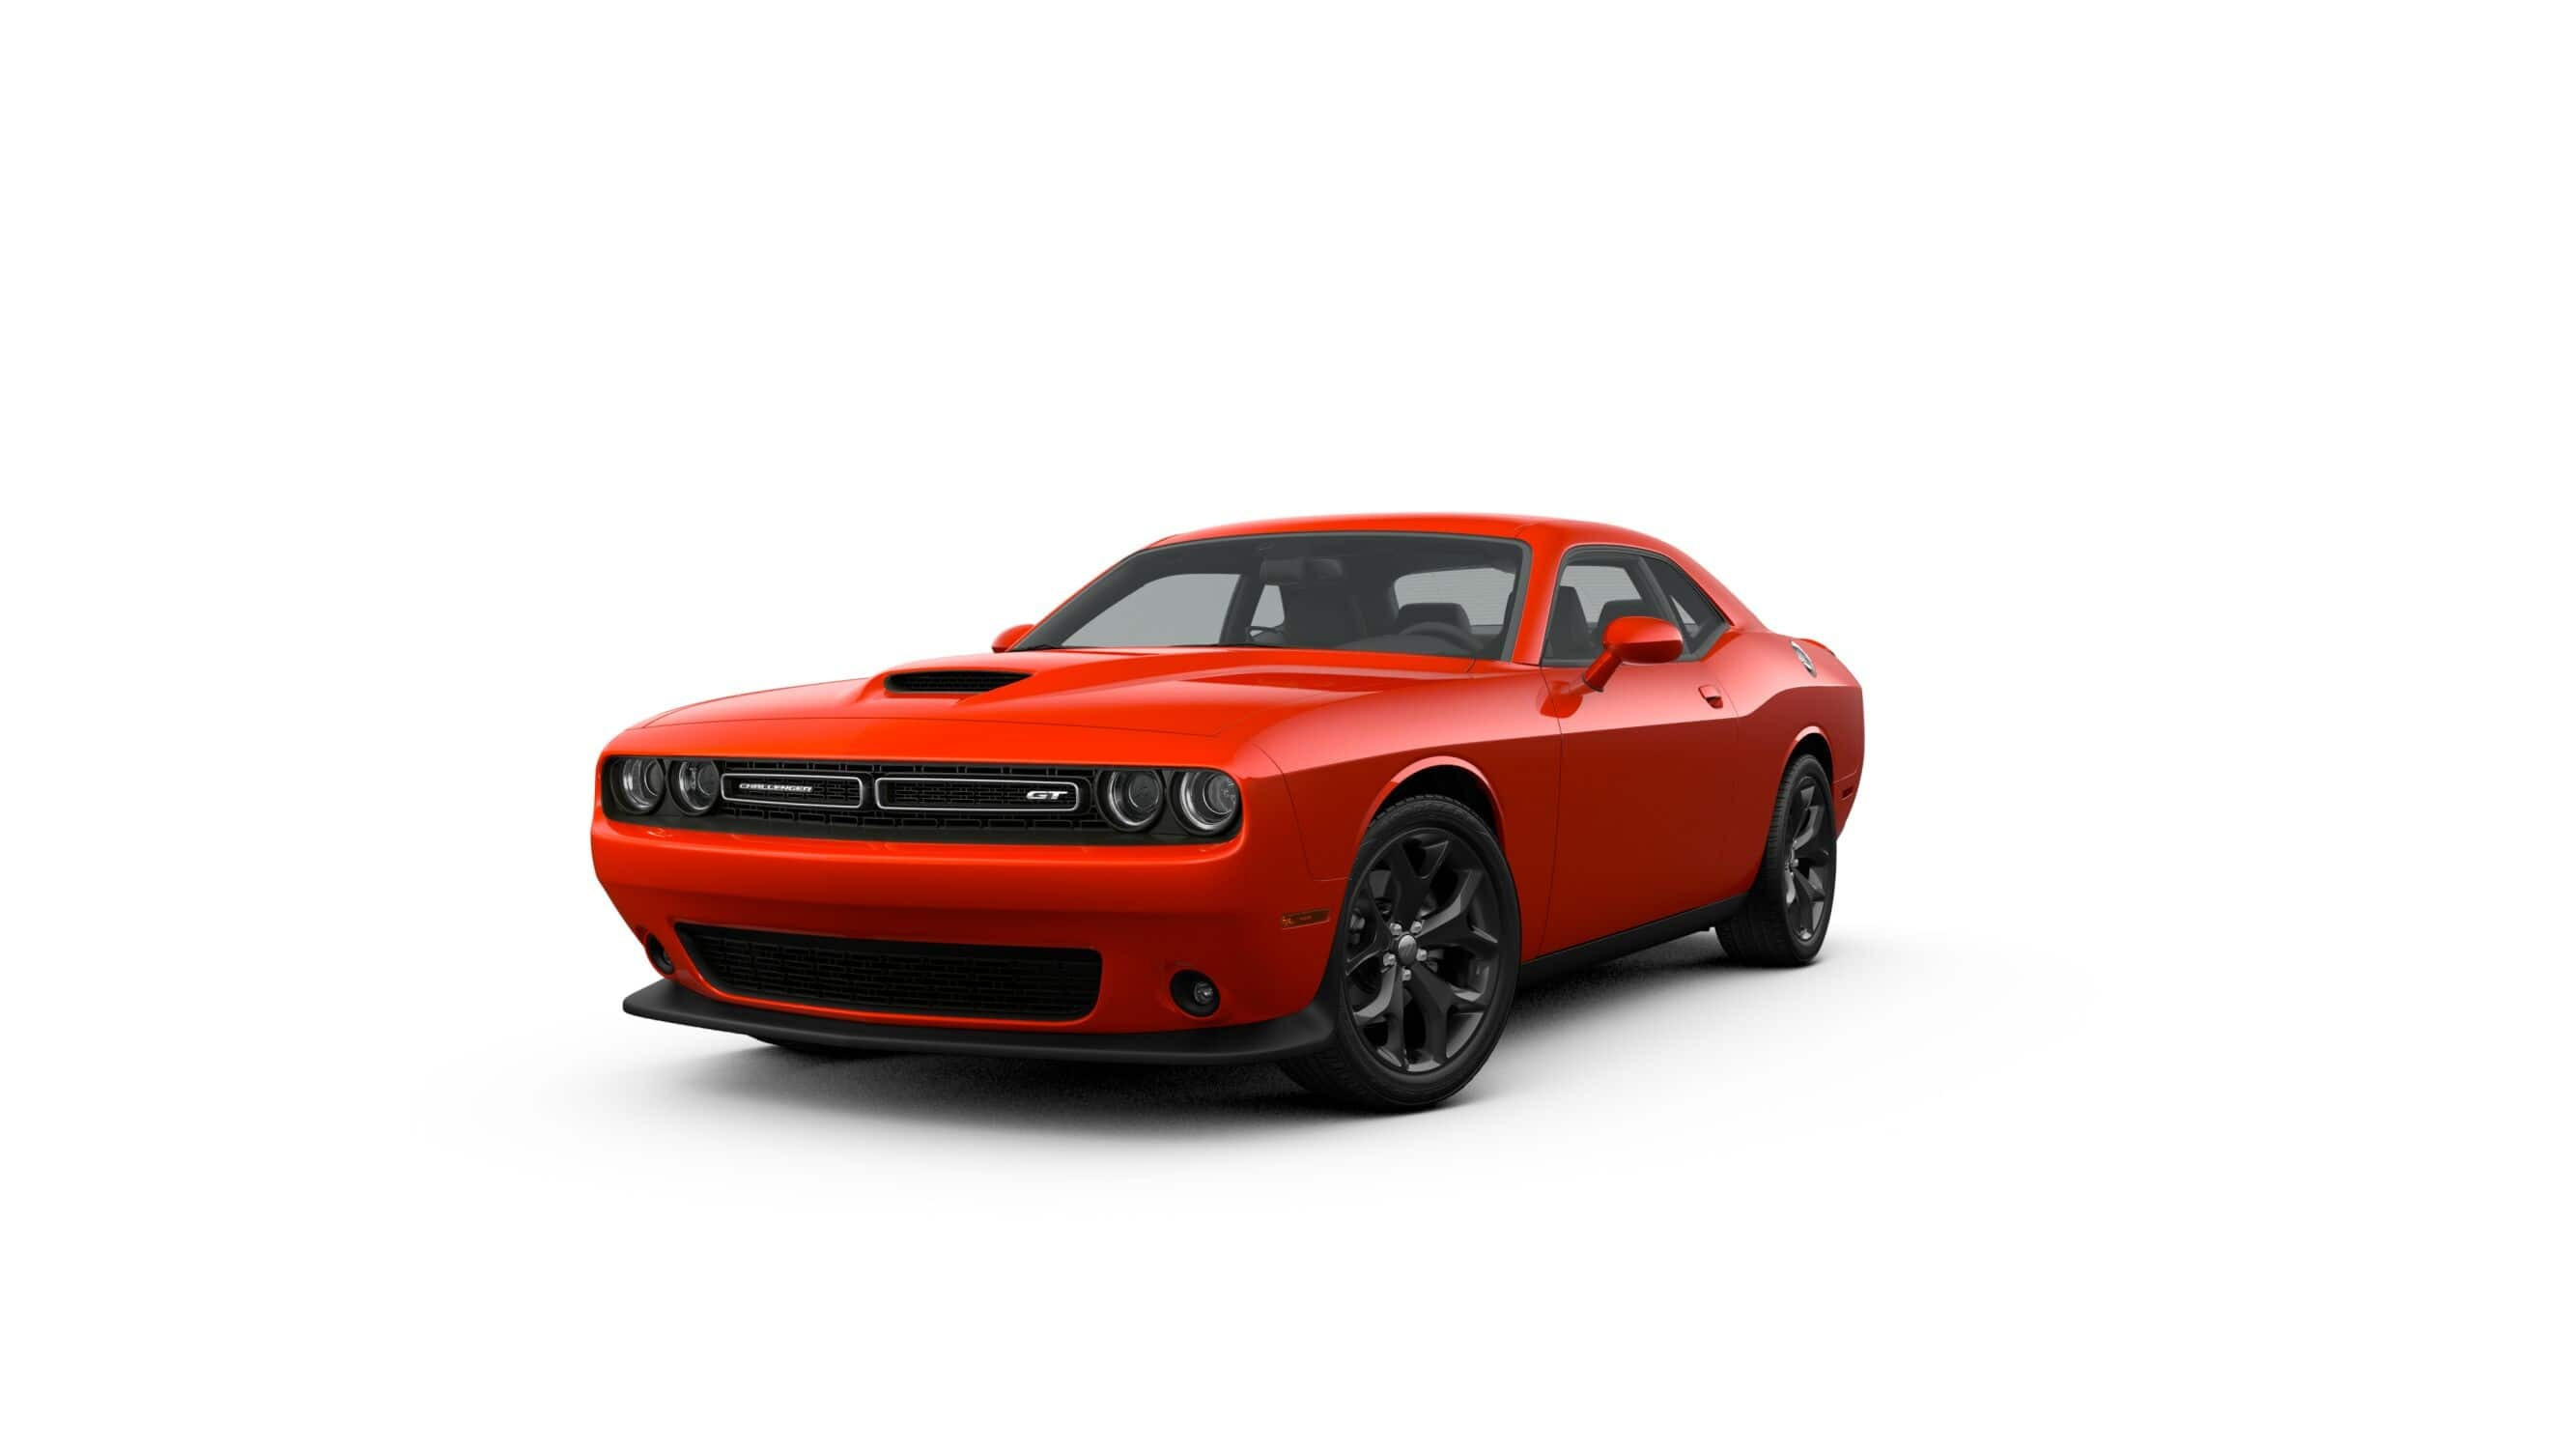 2019 Challenger GT